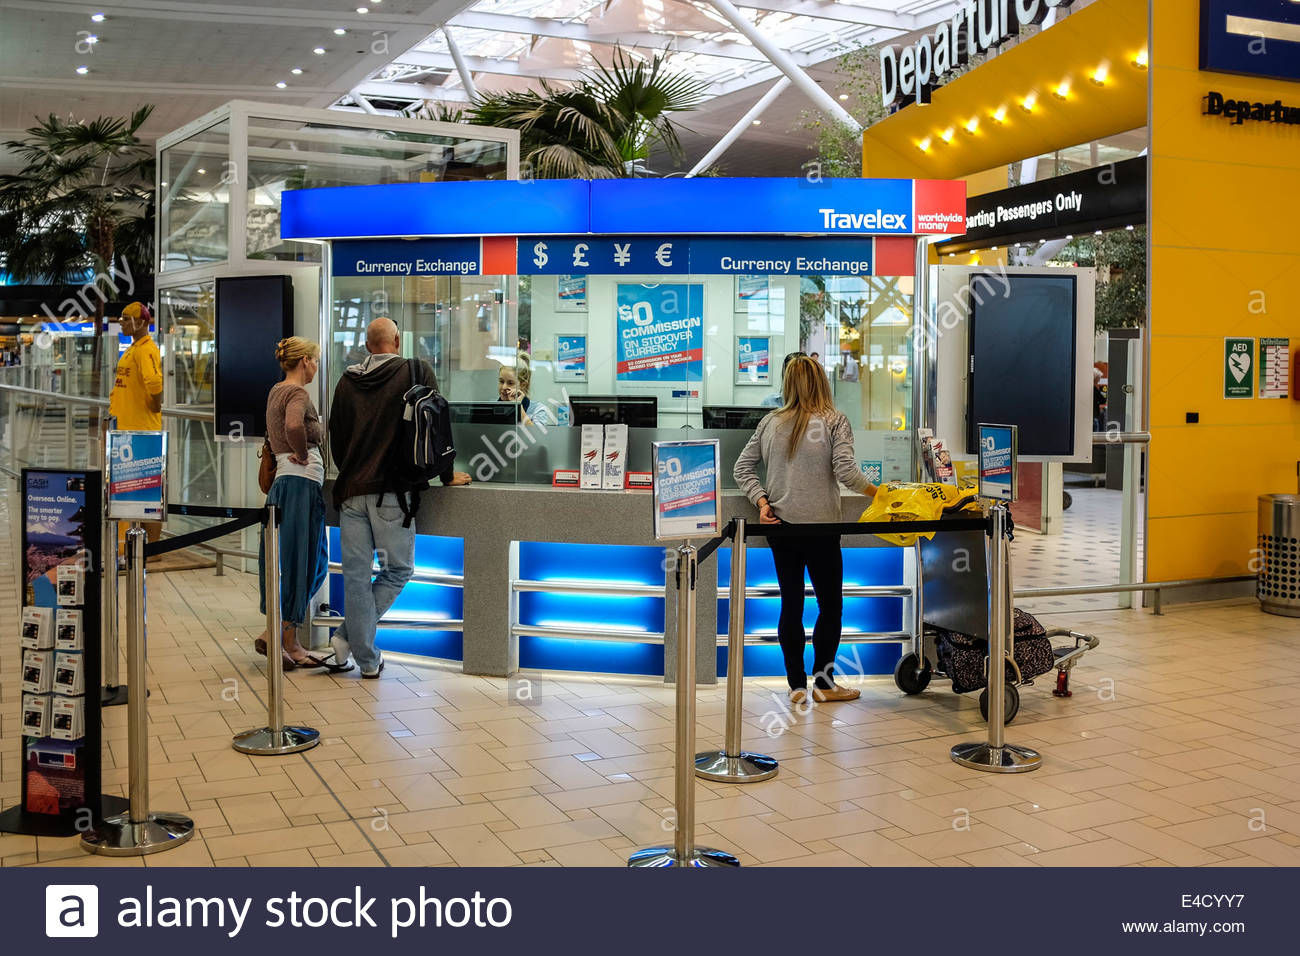 currency-exchange-office-at-brisbane-international-airport-E4CYY7.jpg